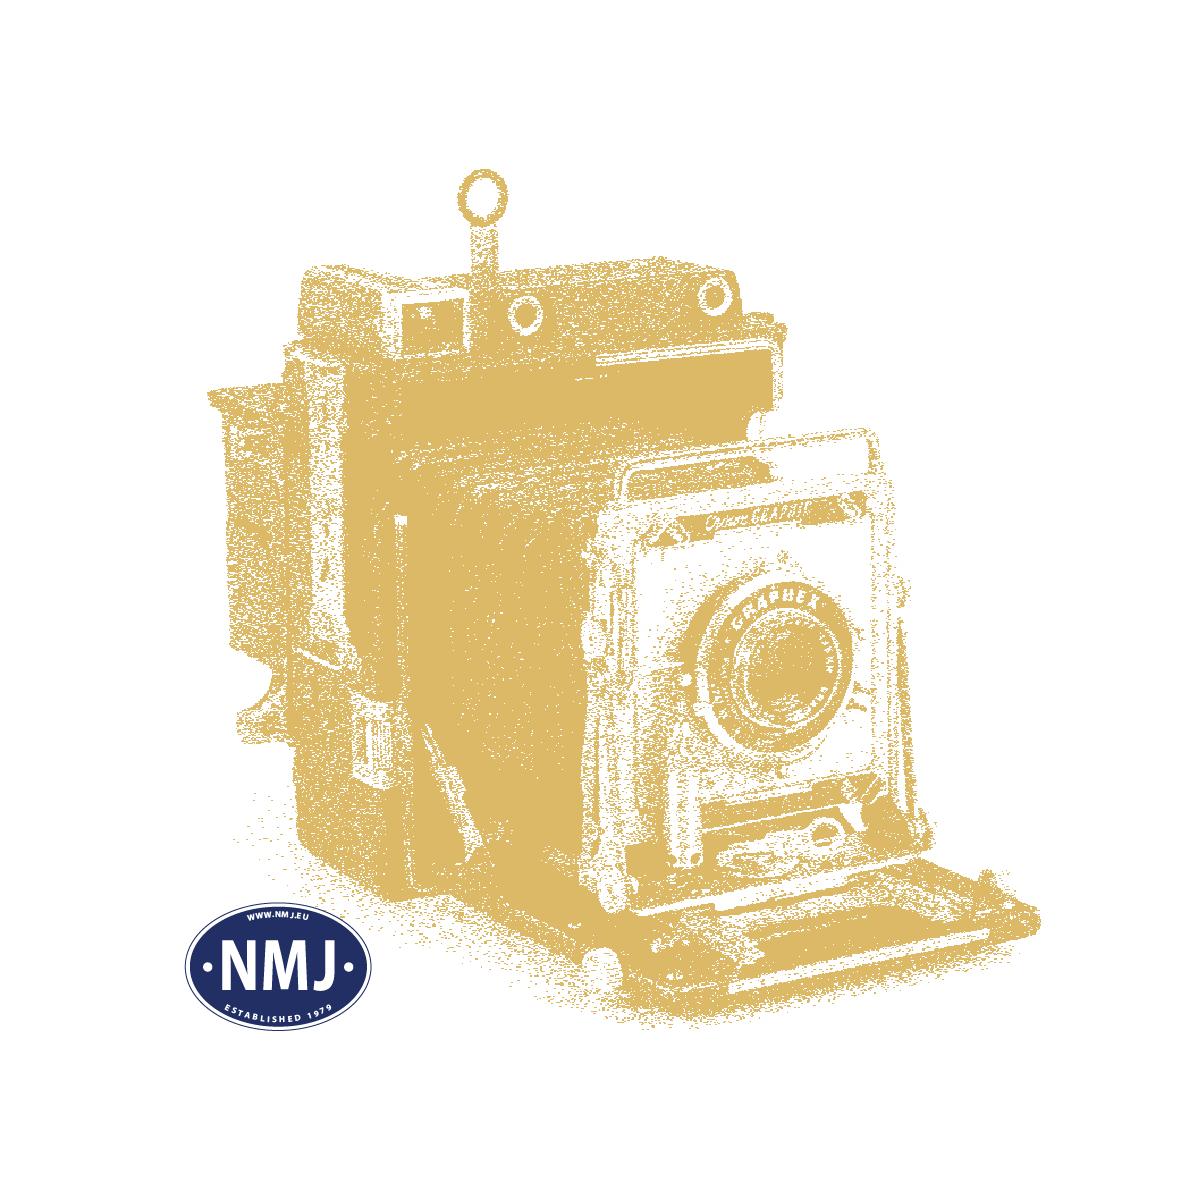 Superline Vogner, NMJSFb0016-NMJ-Superline-NSB Fb-w 603 0016-1-T.2 -wood-chip-waggon-handmade-brassmodel-HO, NMJSFb0016